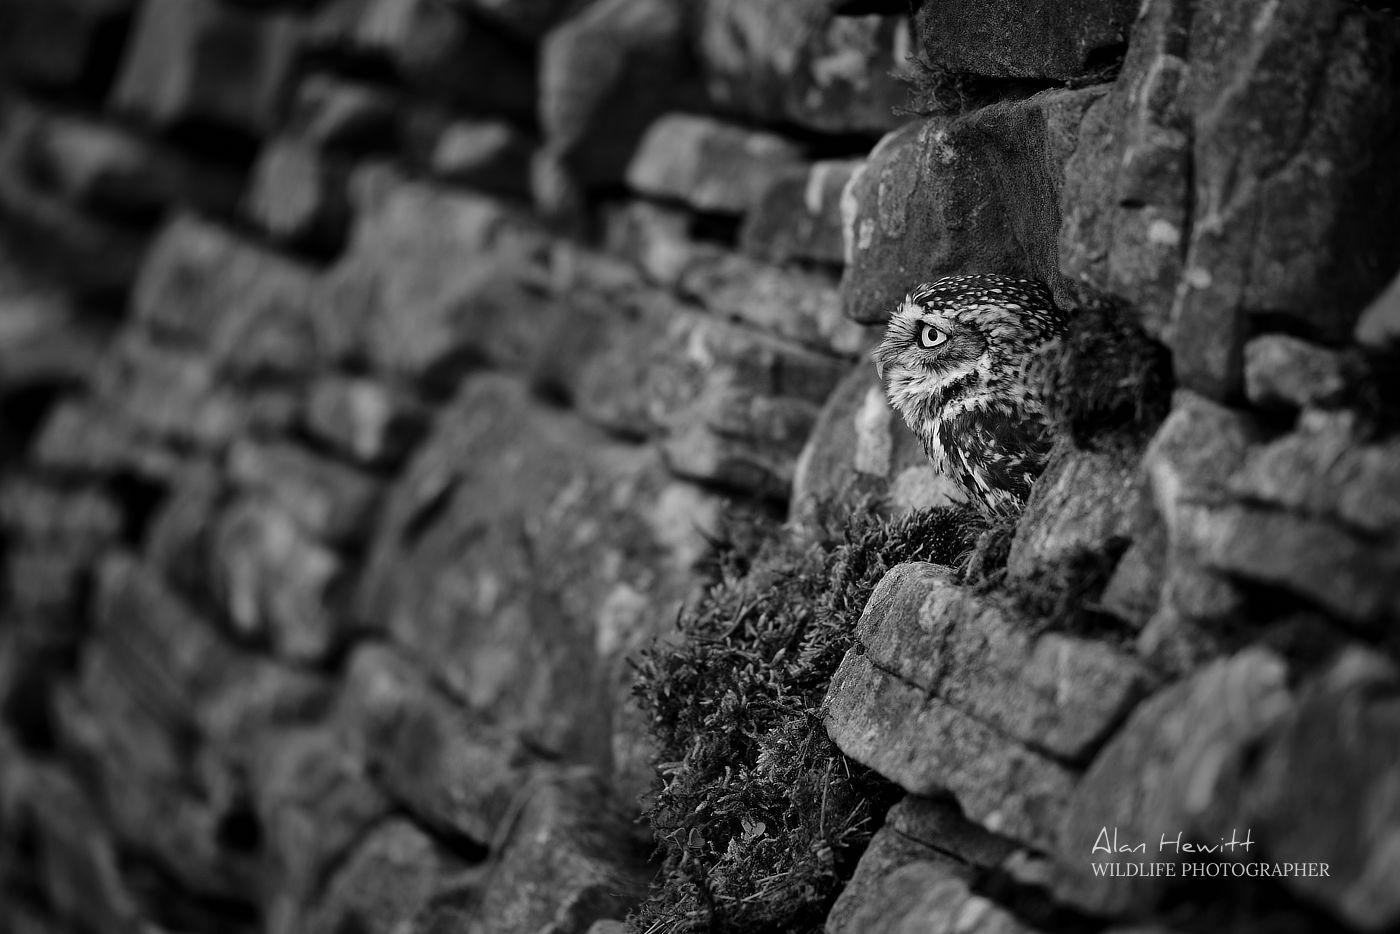 Little Owl, Northumberland Birds of Prey Photography Workshop